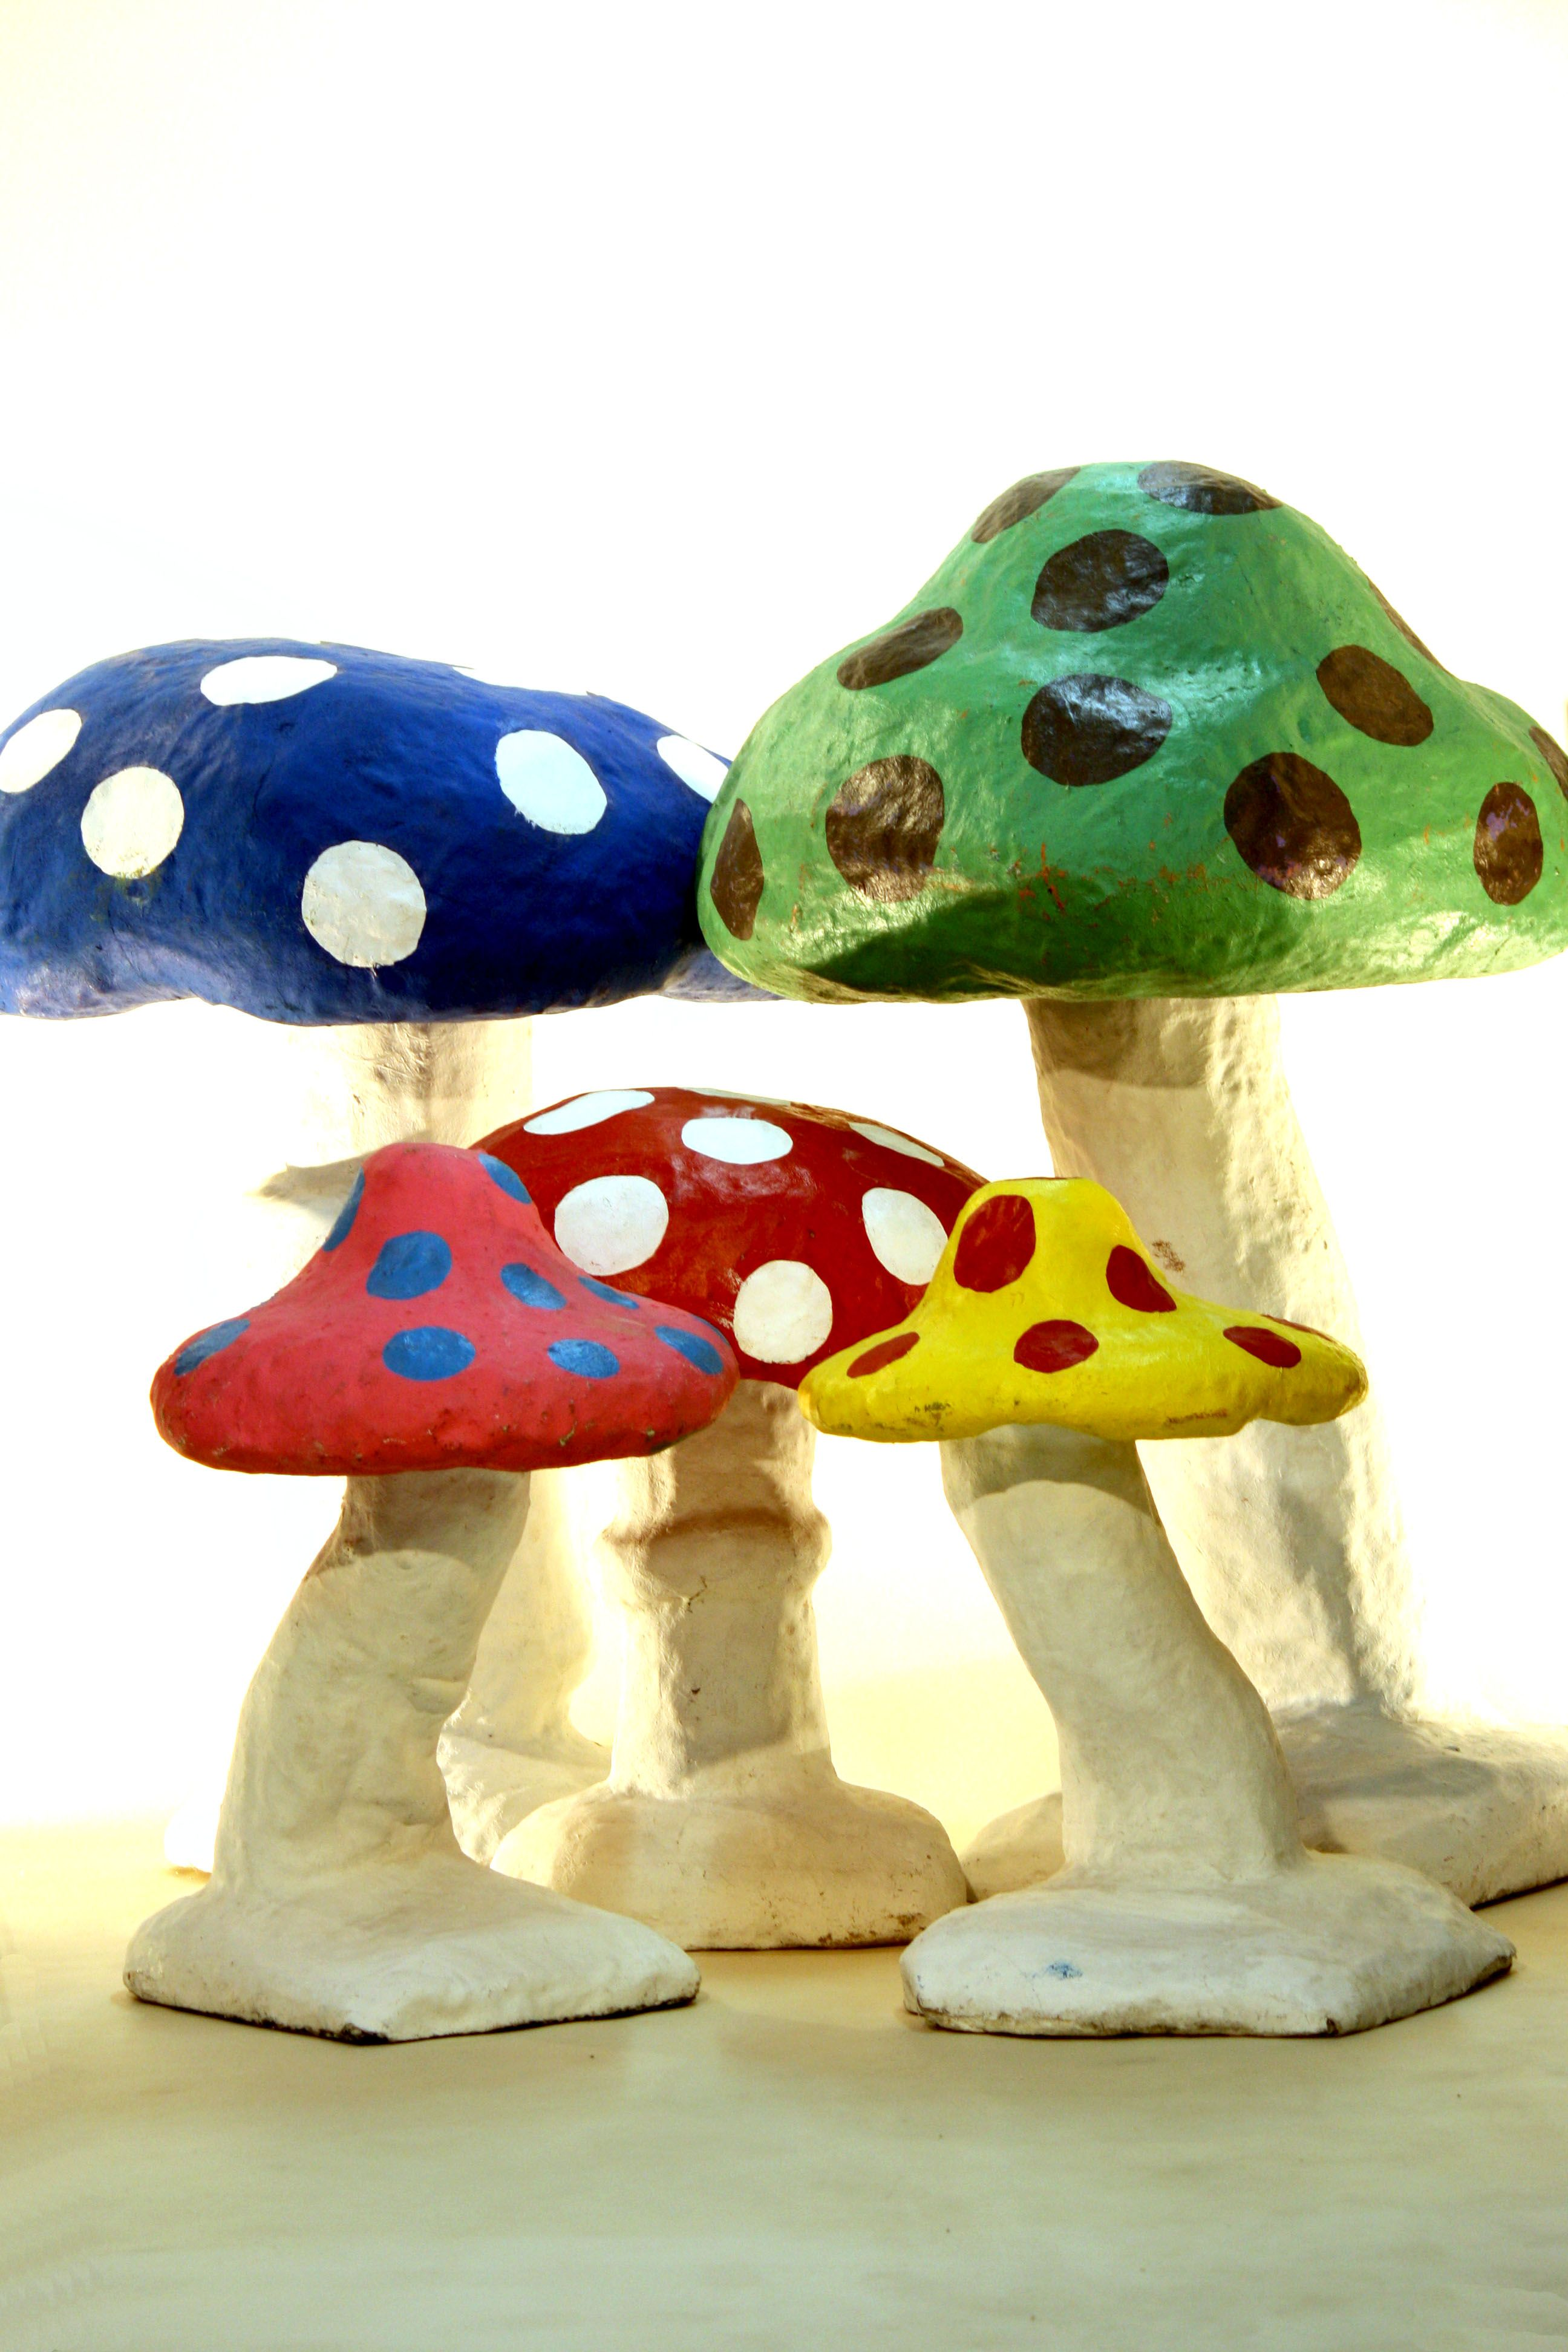 oversized giant props   Giant Mushroom Hire – Set of 5 Giant